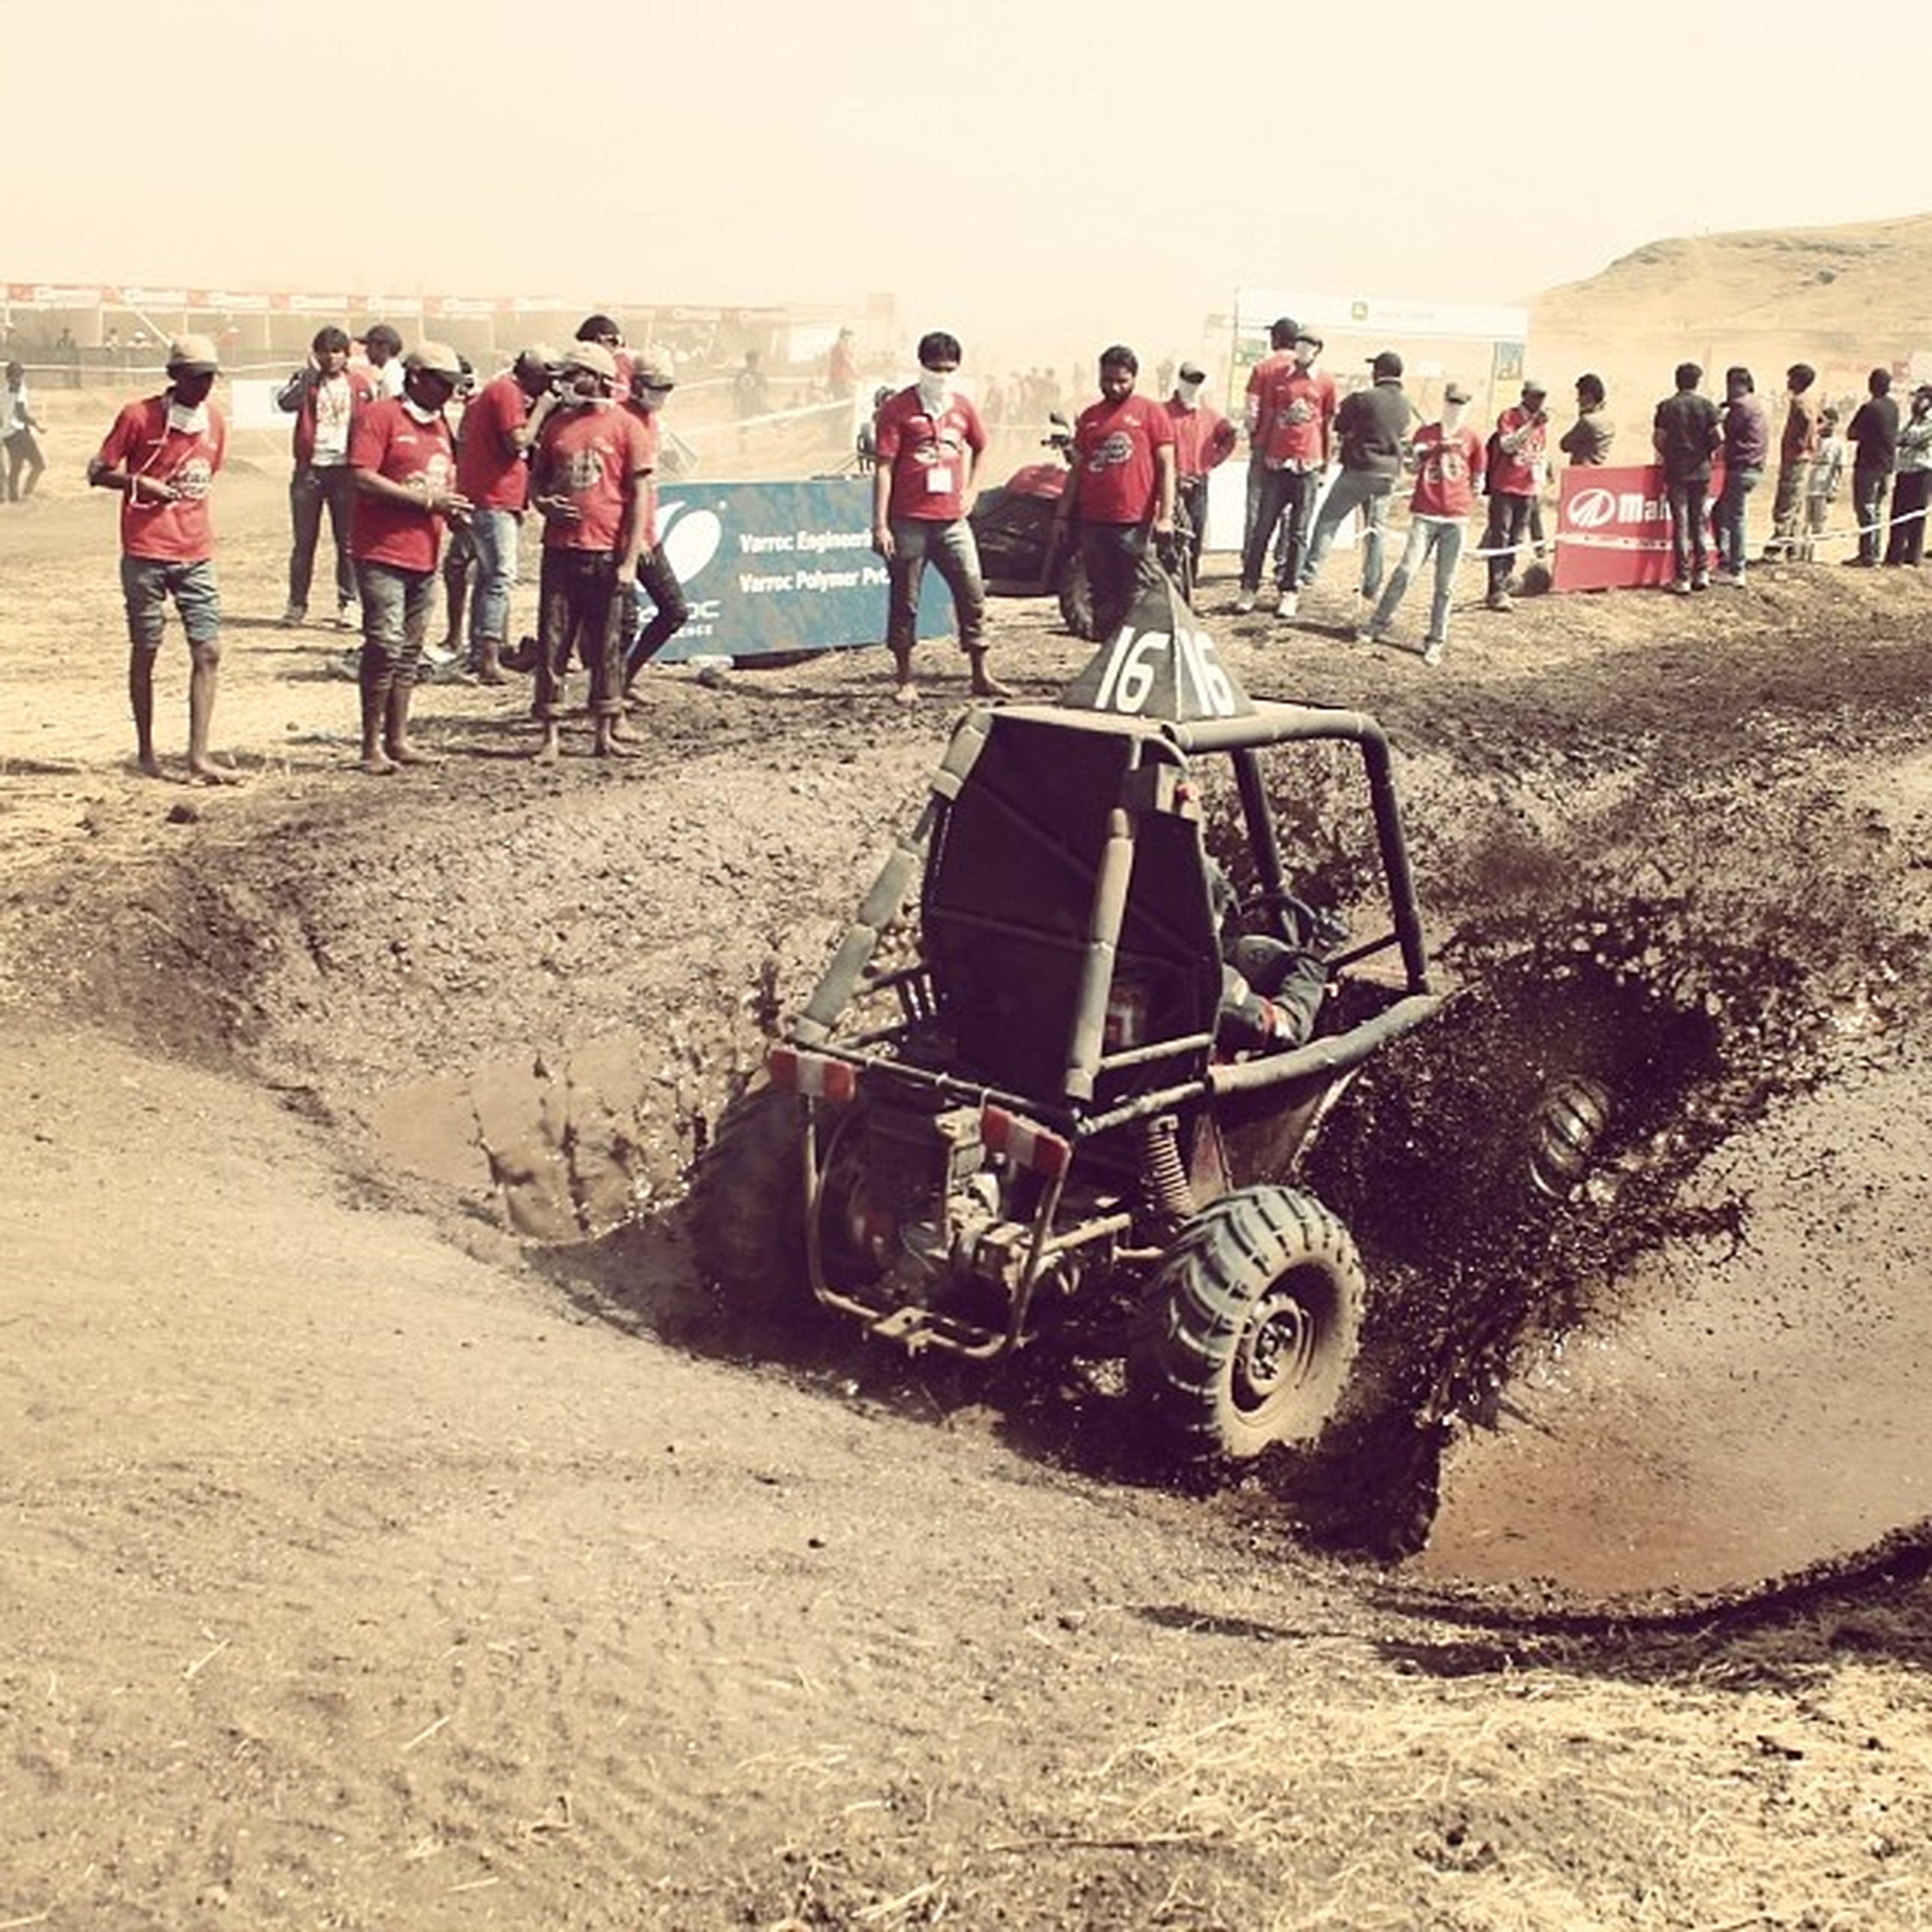 Baja Baja2014 Cars Mud dirty racing atv class event